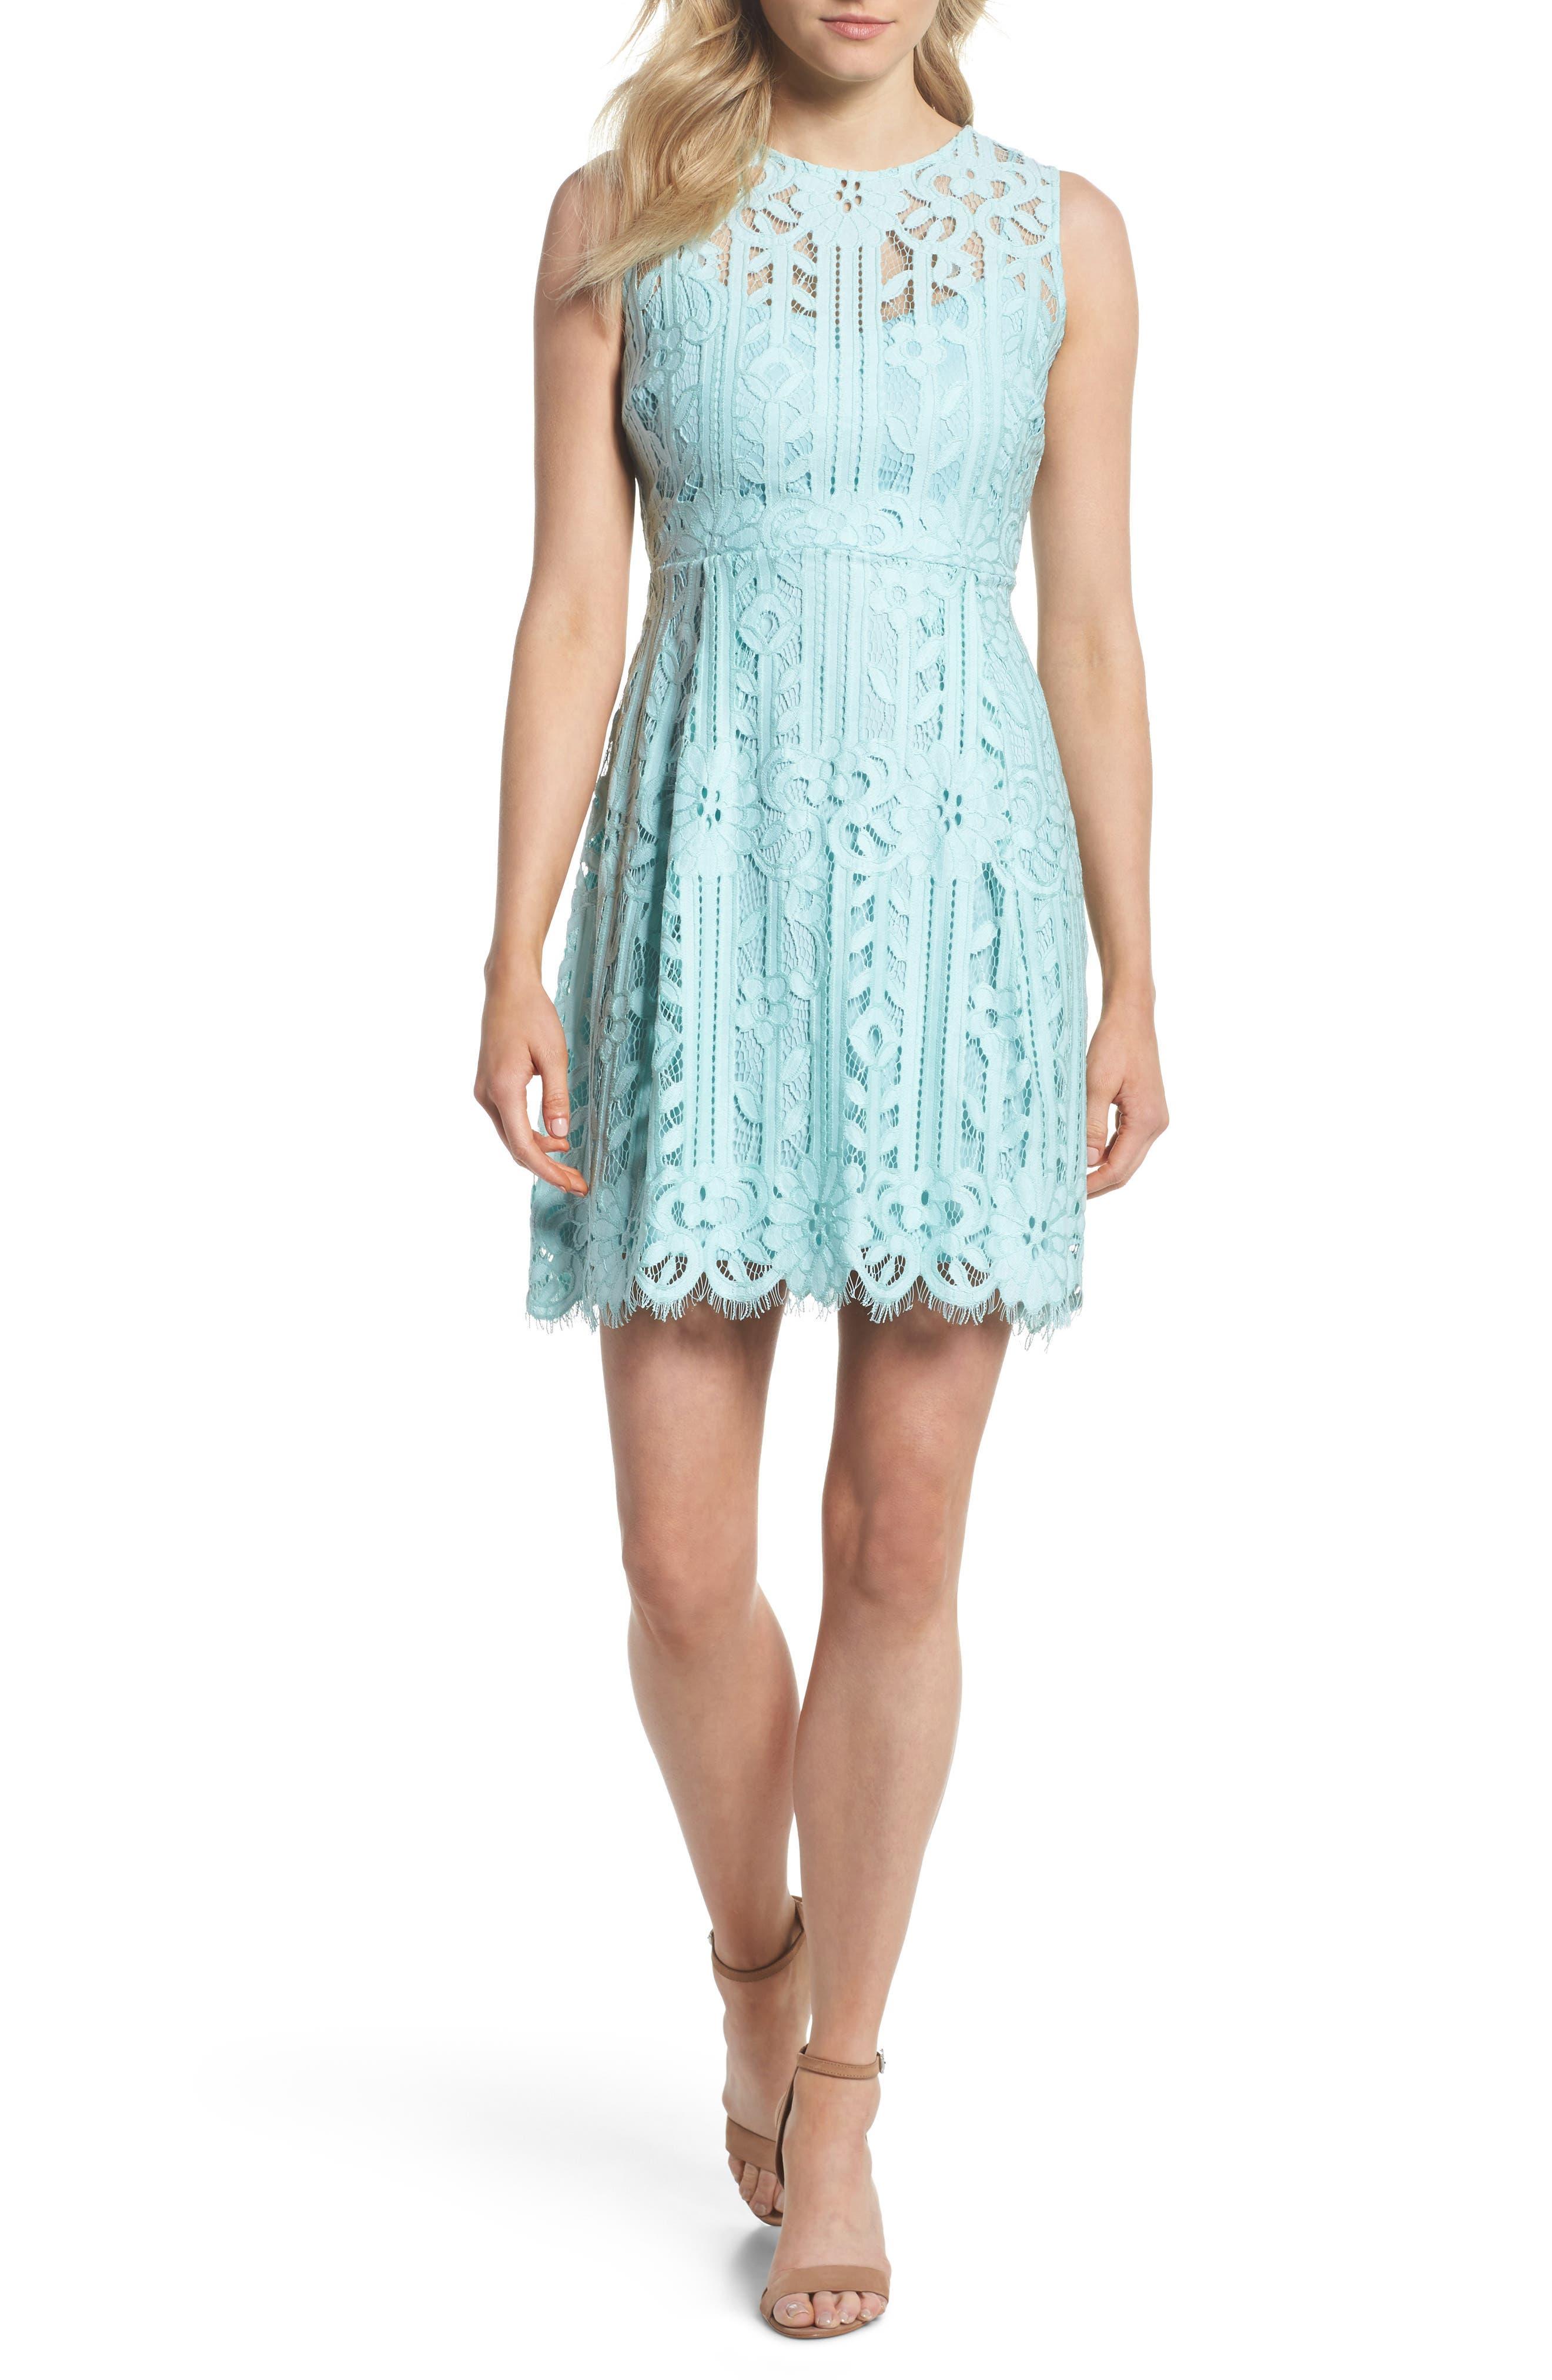 JULIA JORDAN Sleeveless Lace Dress, Main, color, 332